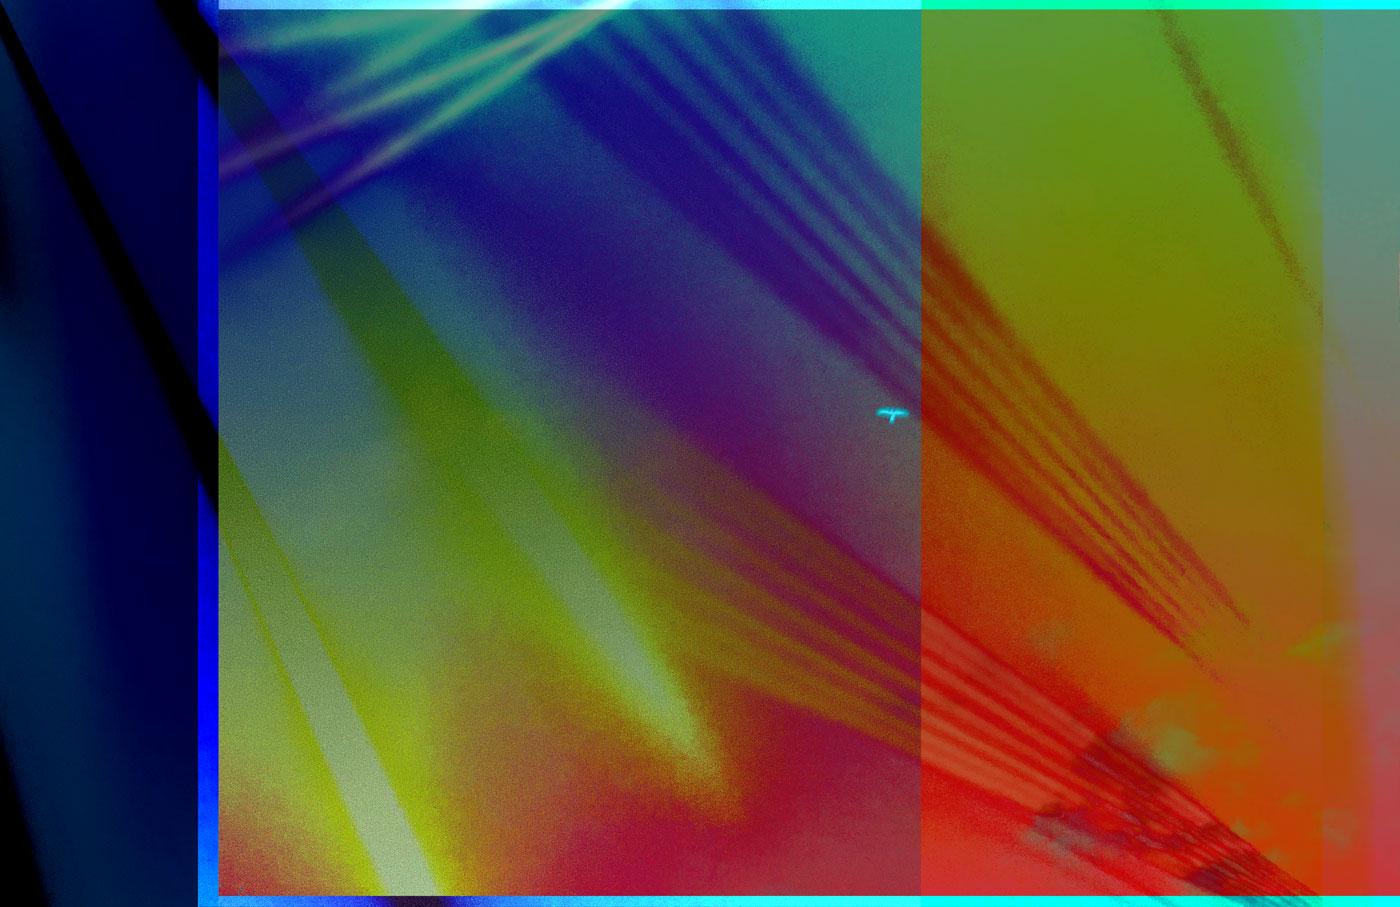 Third Light • 122 x 79 cm (48.03 x 31.1 in)